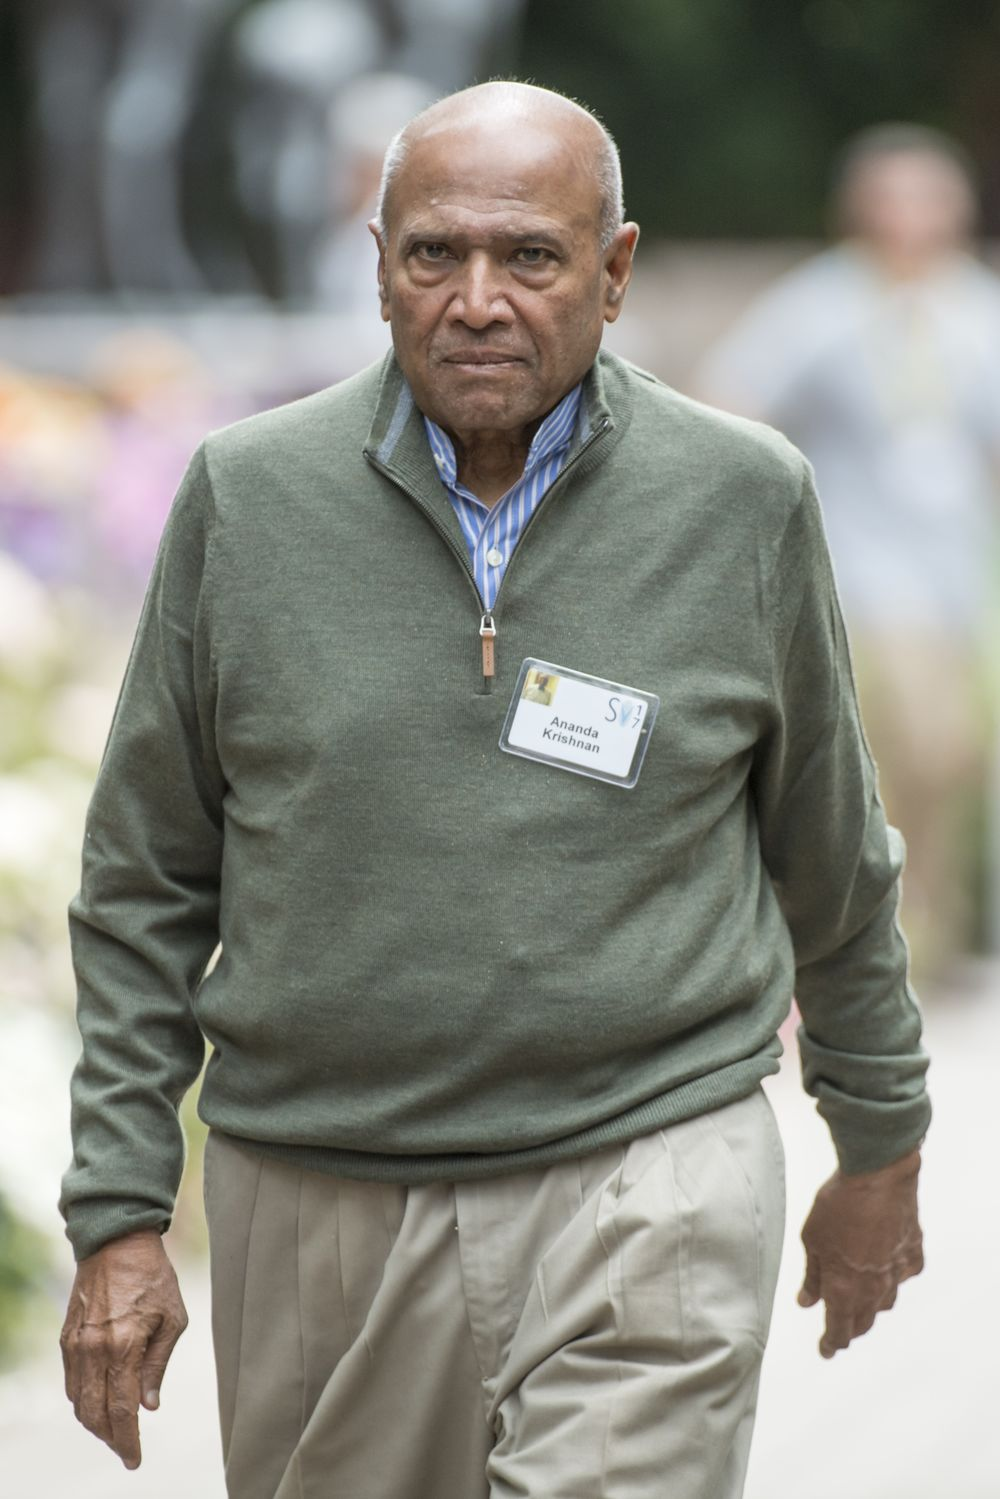 Astro Soars as Billionaire Krishnan Is Said to Consider